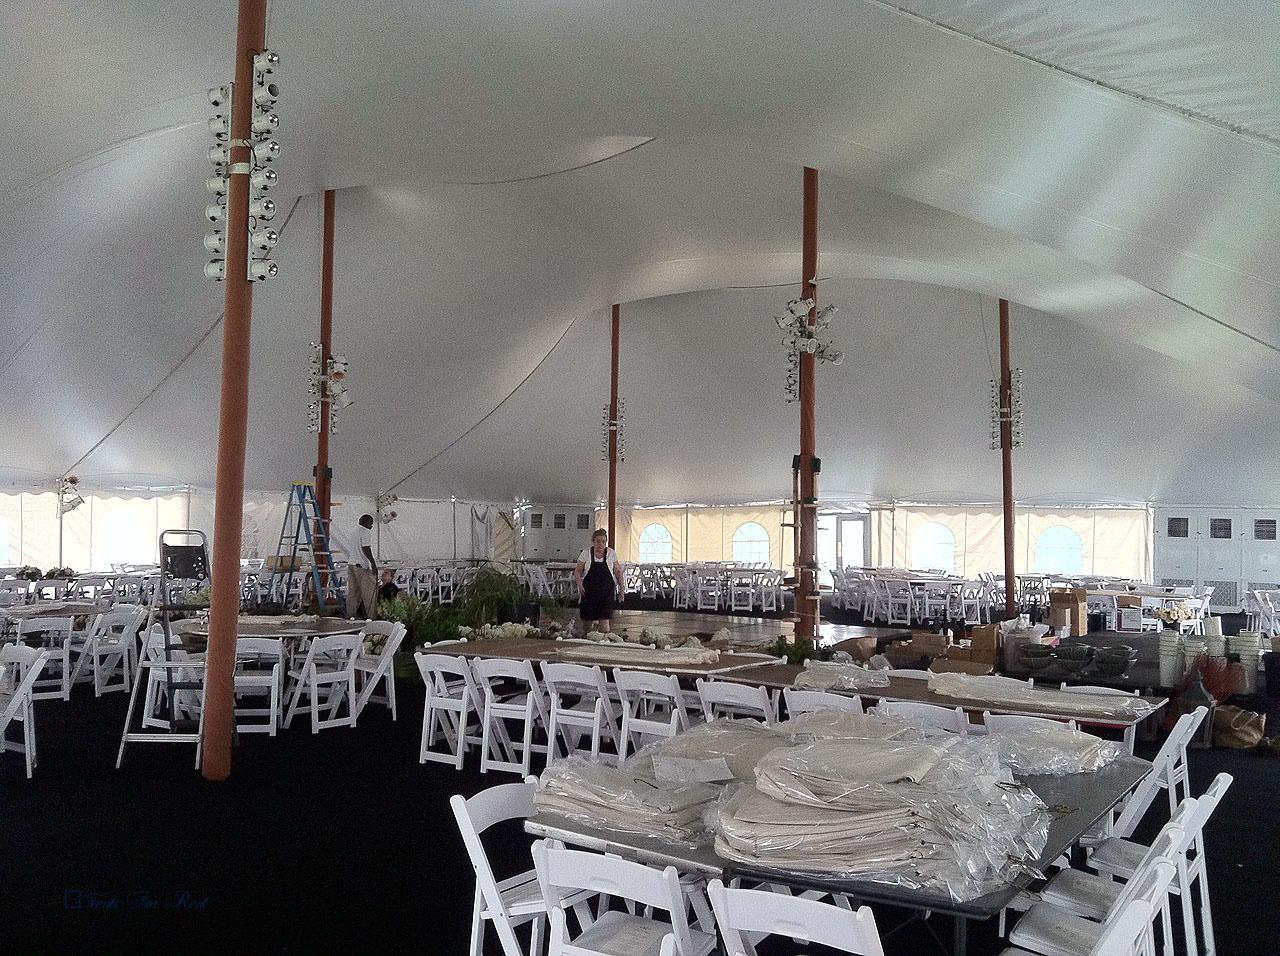 Large wedding tents for rent in Bensalem